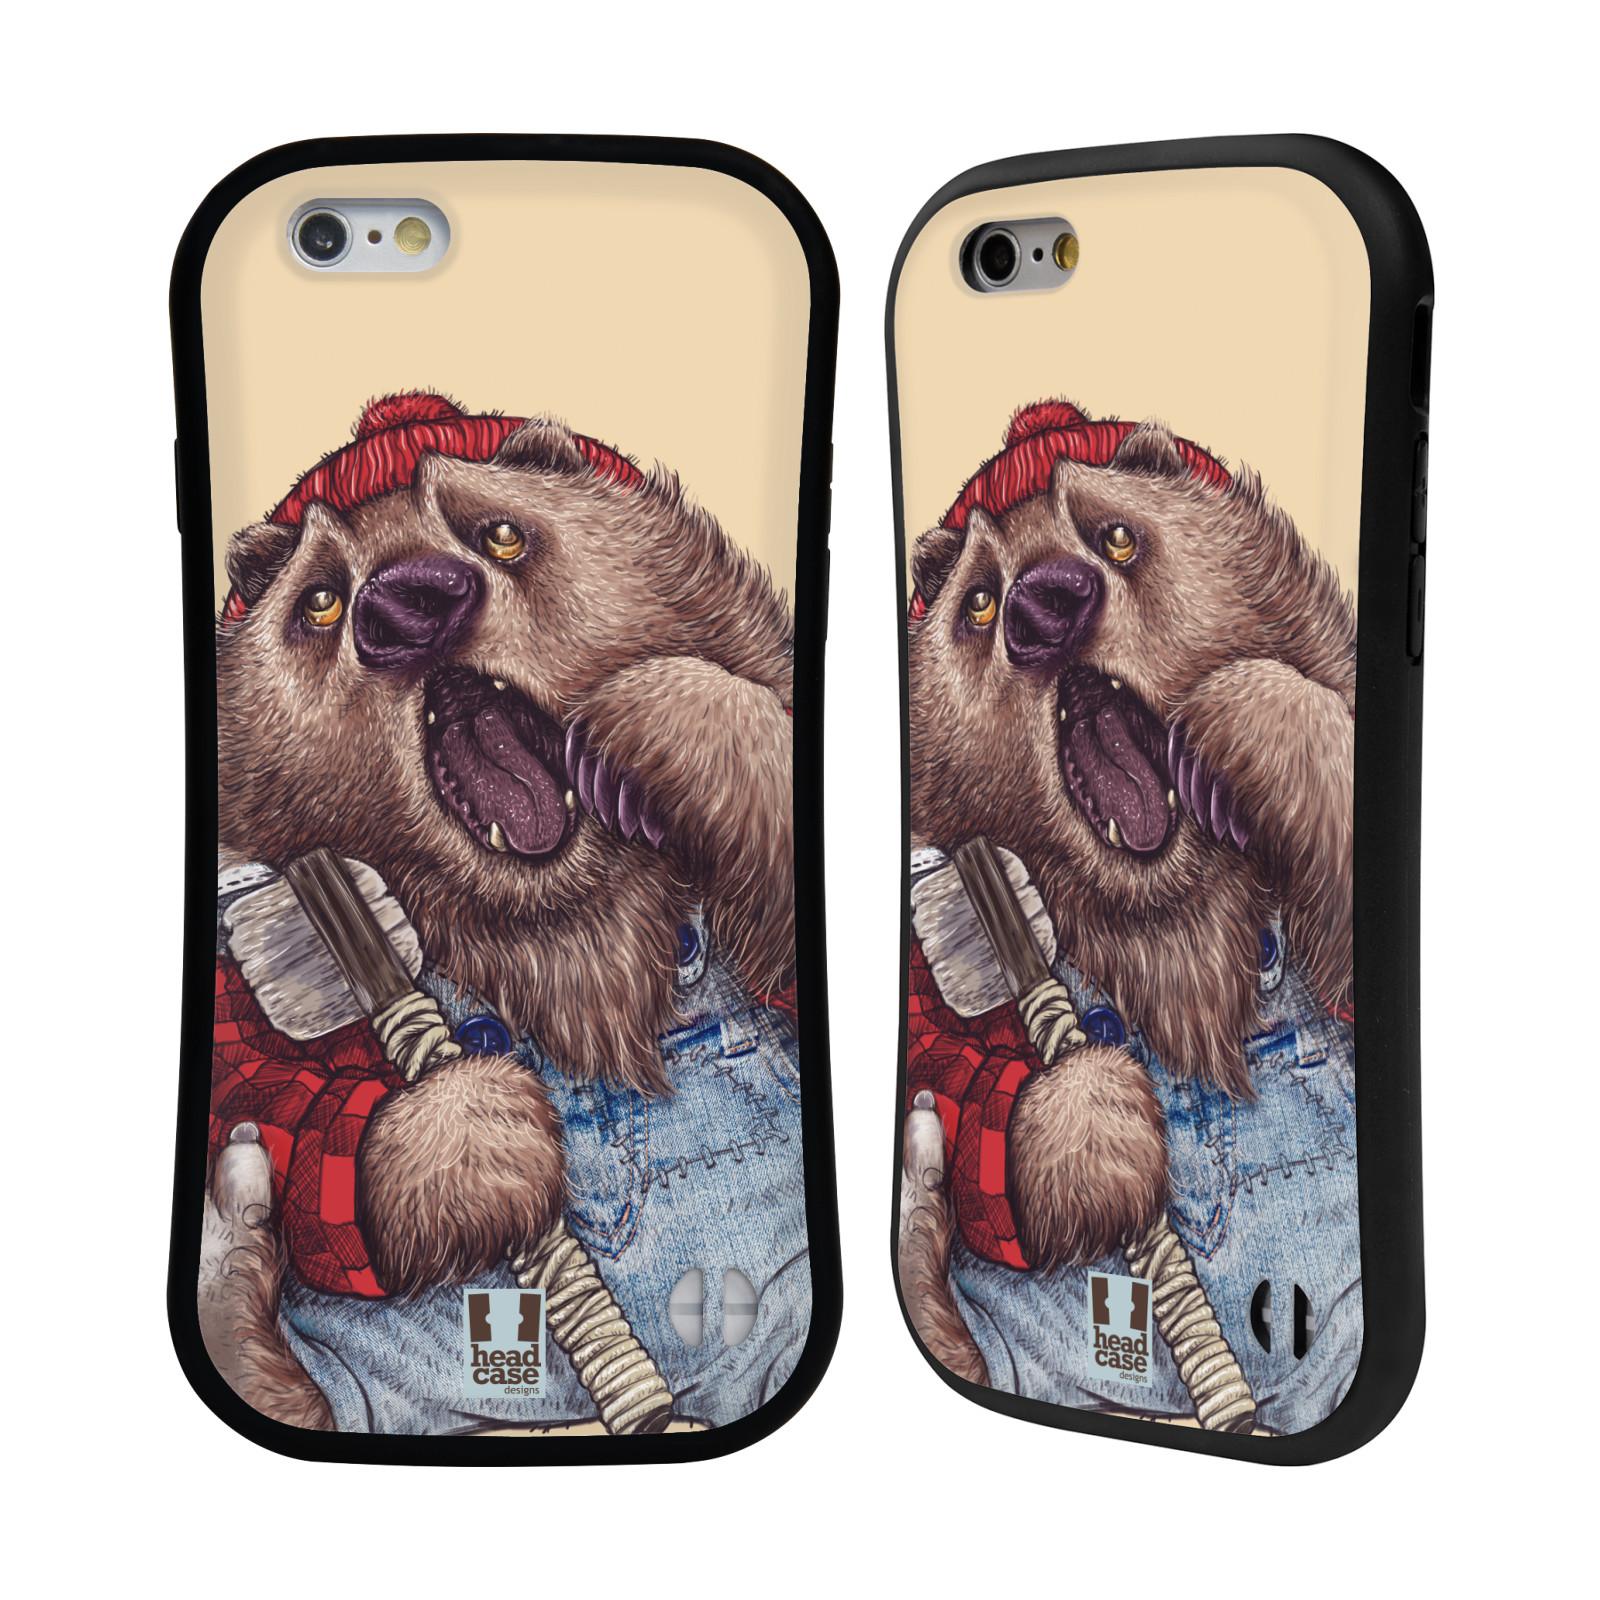 HEAD CASE silikon/plast odolný obal na mobil Apple Iphone 6/6S vzor Kreslená zvířátka medvěd